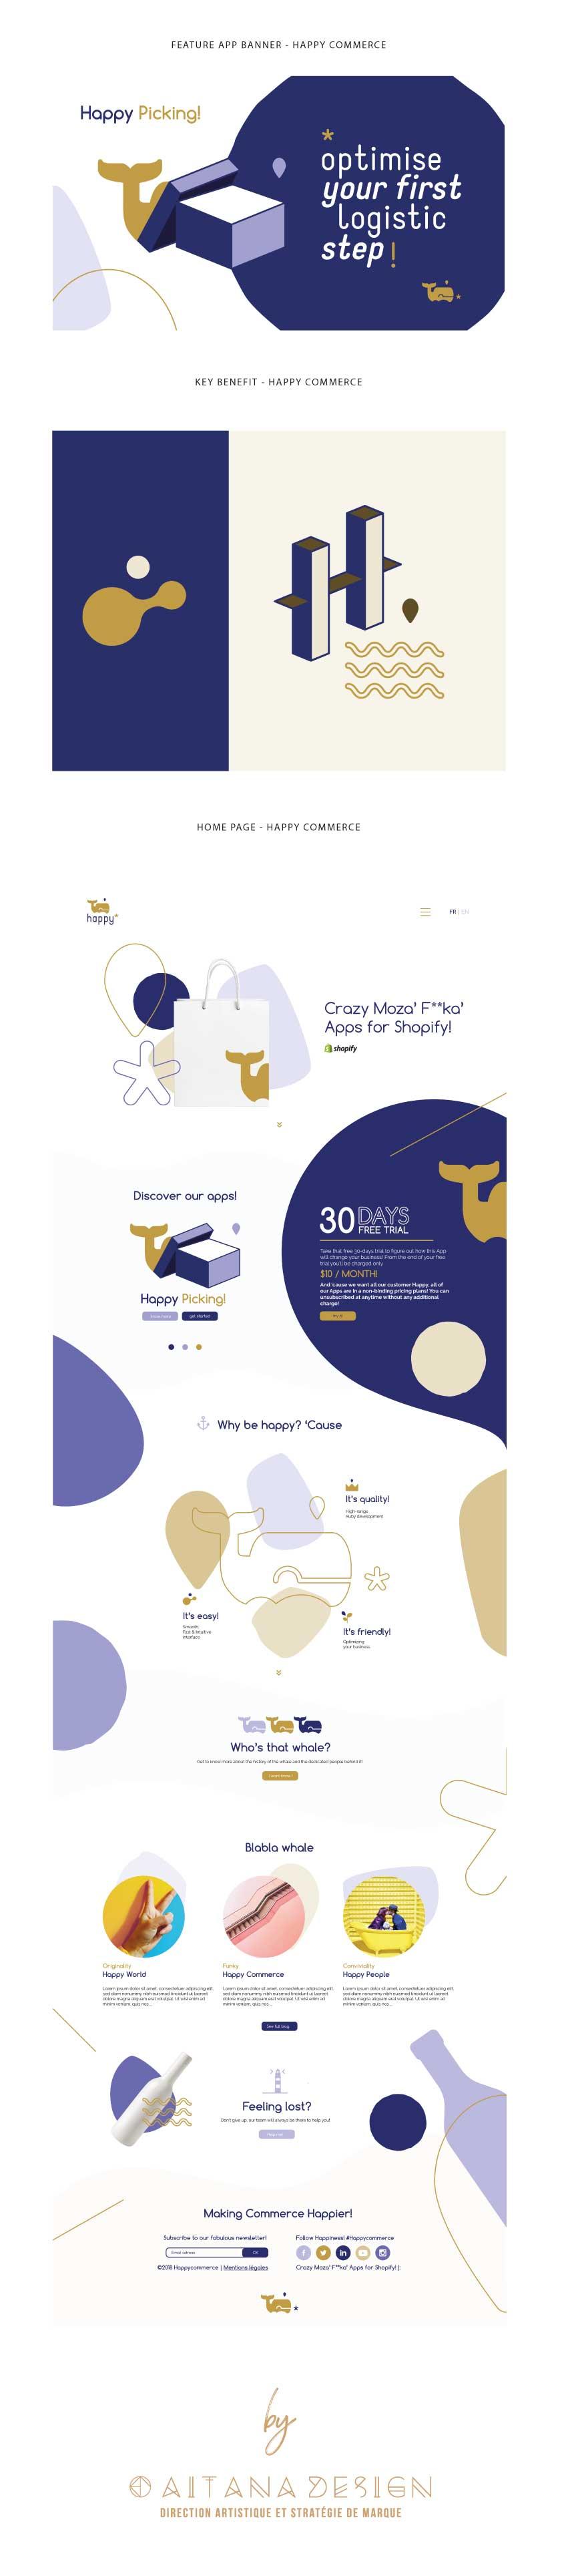 3-Branding-Happy-Commerce-By-Aitana-Design